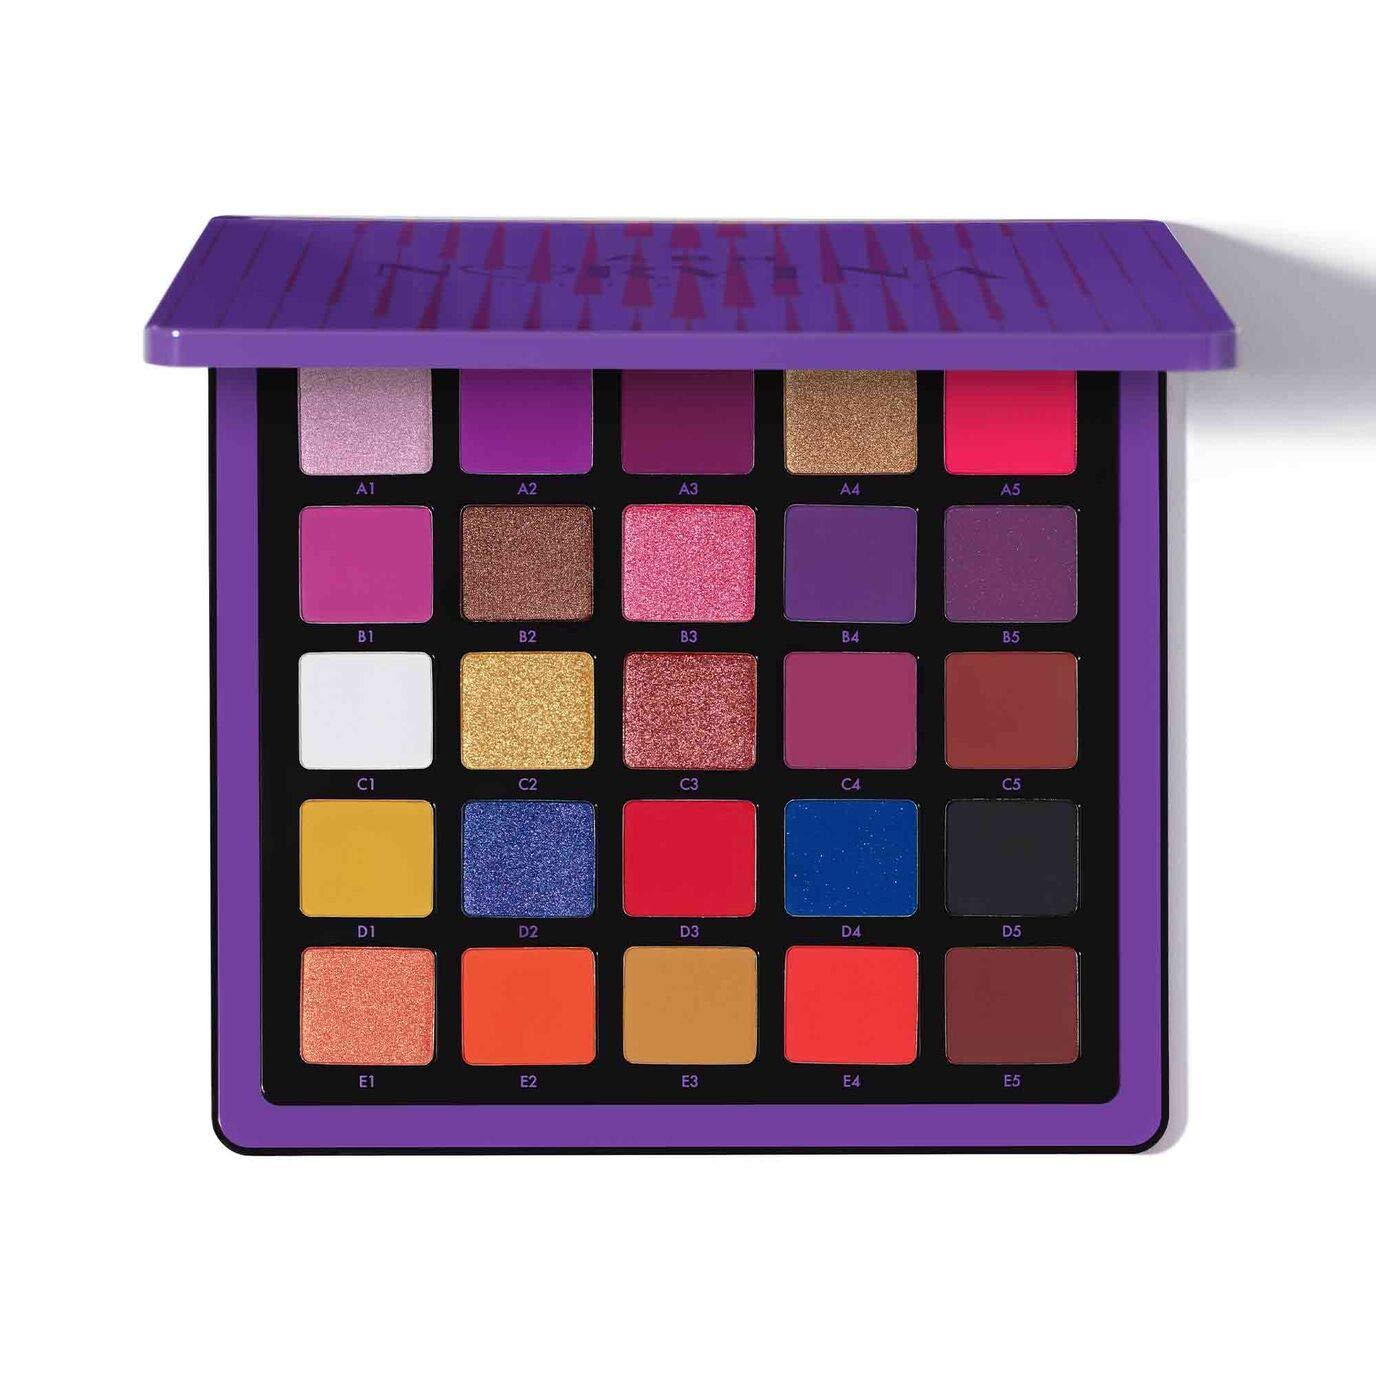 Anastasia Beverly Hills Norvina Pro Pigment Palette, Vol. 1